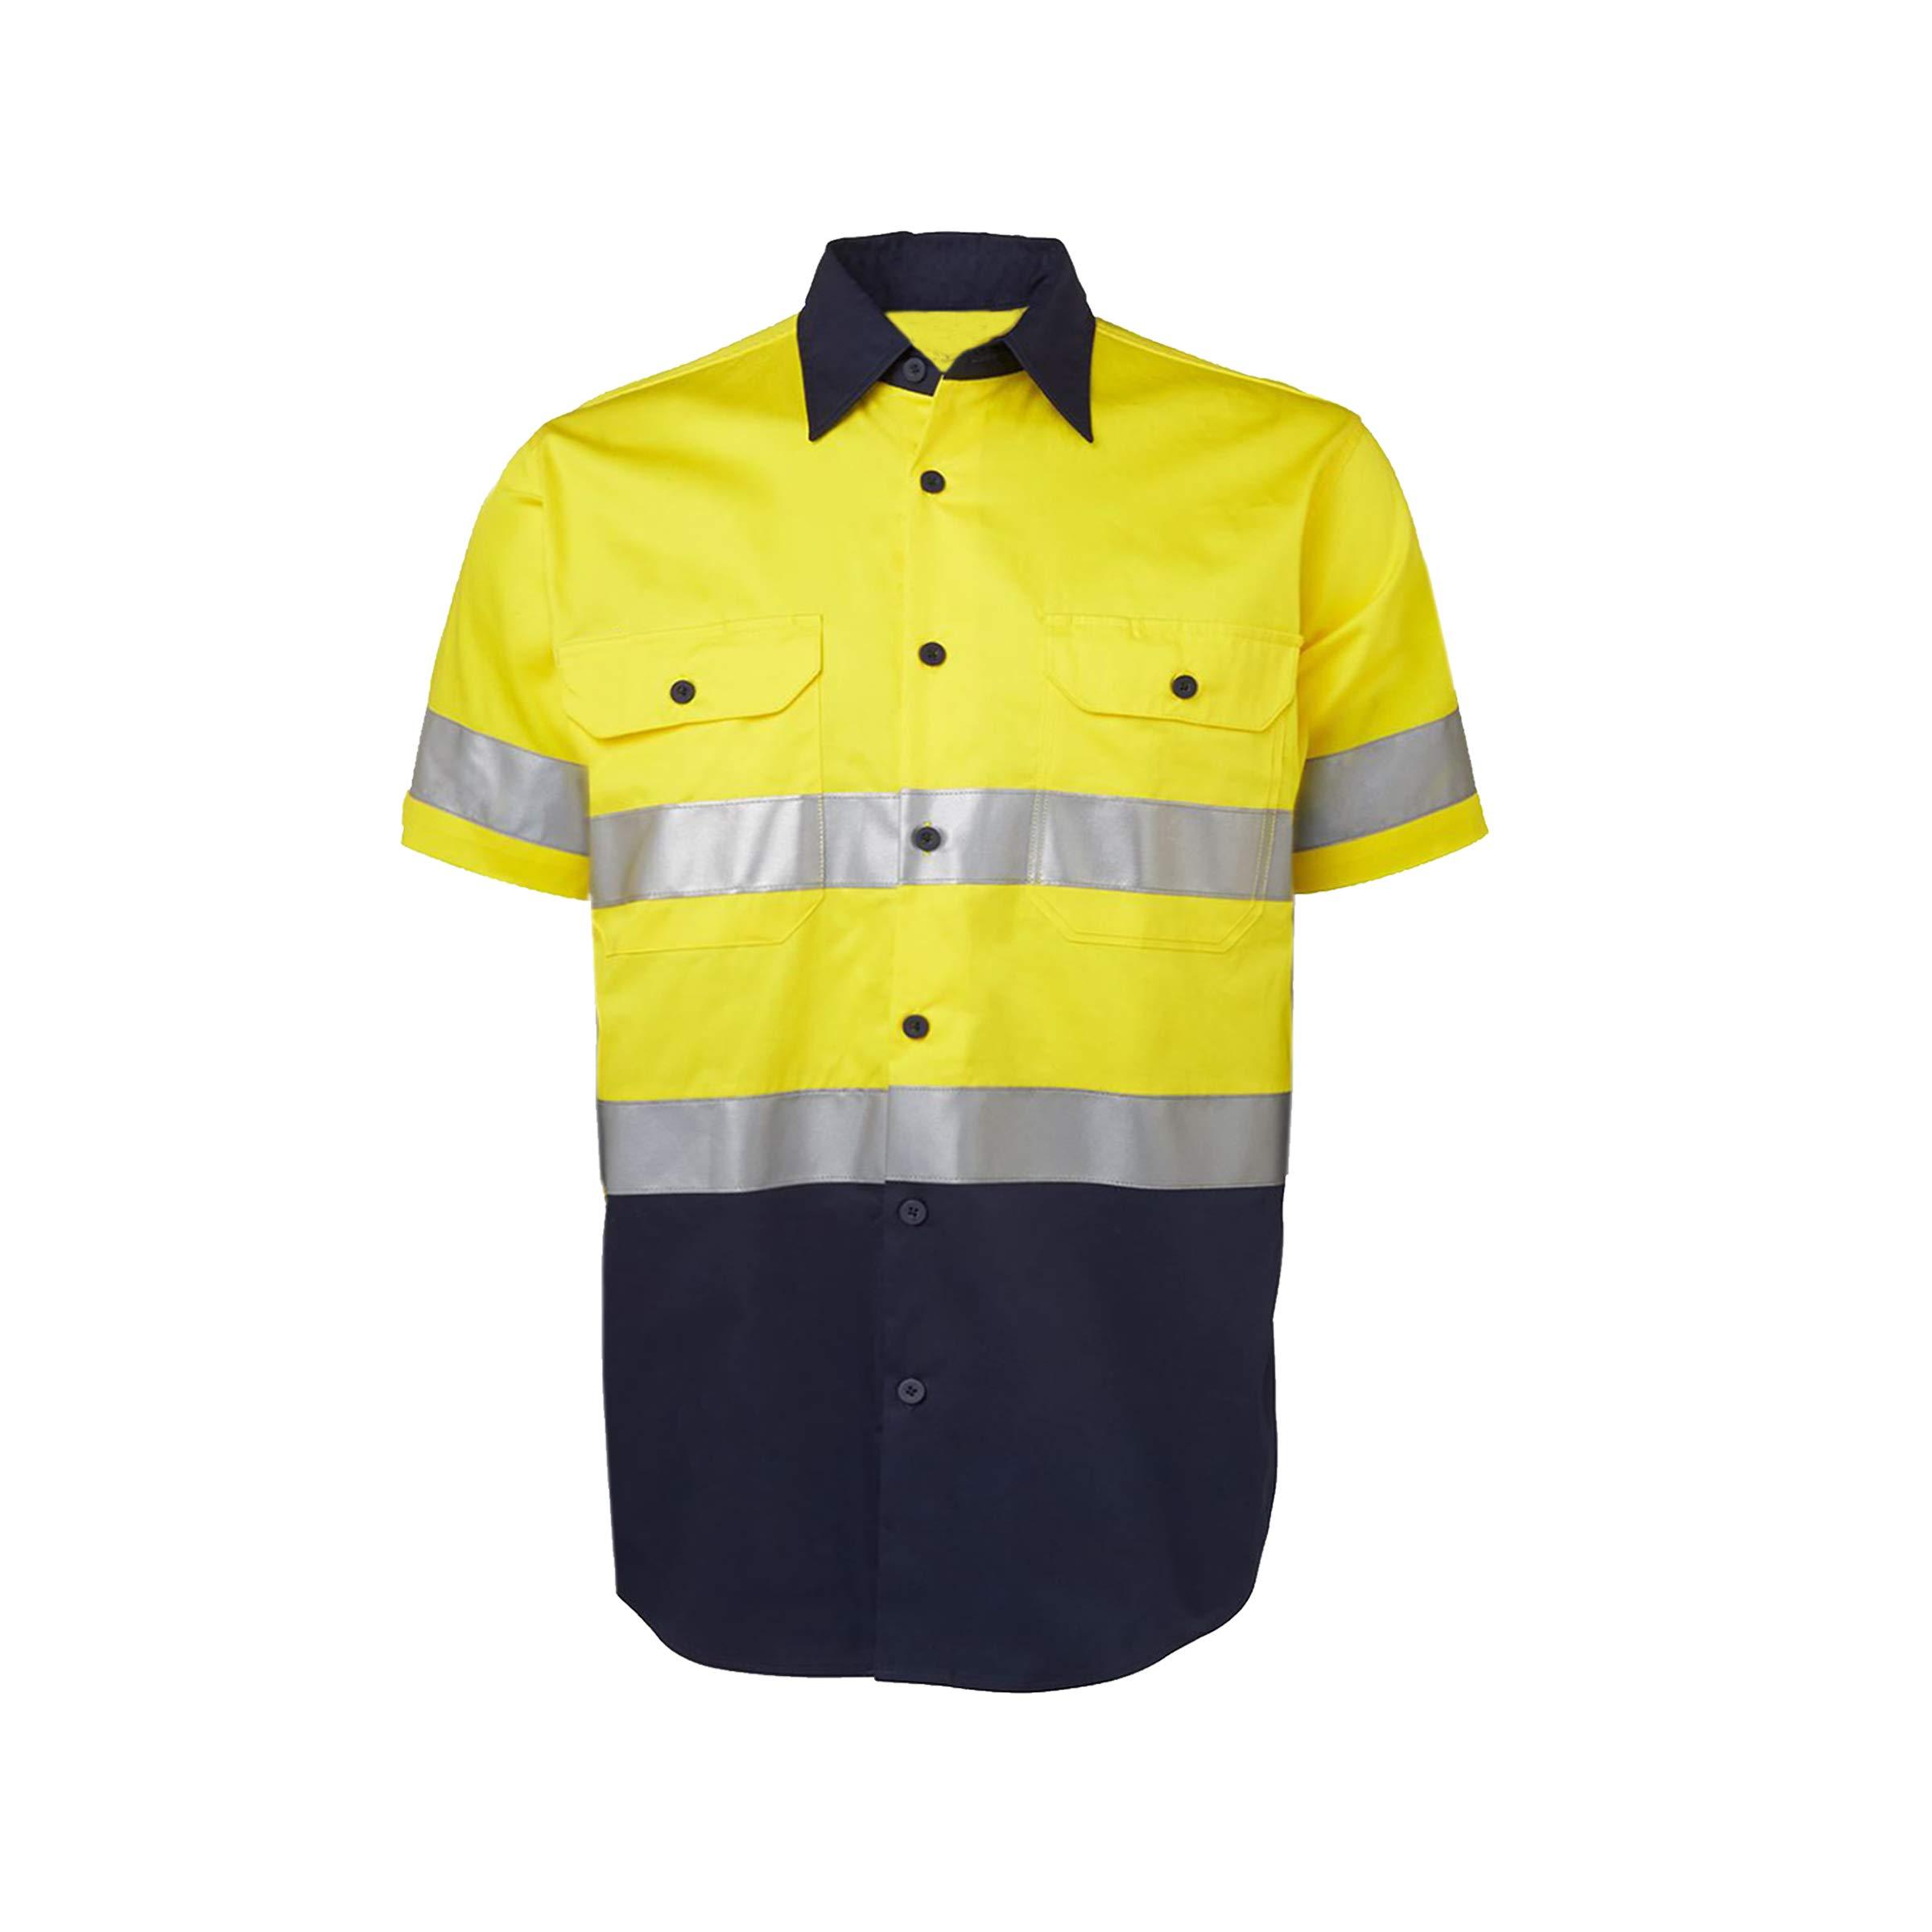 Hi Vis Safety Work Shirt 155gsm Light Wight,Short Sleeve,Reflective Vents Tops